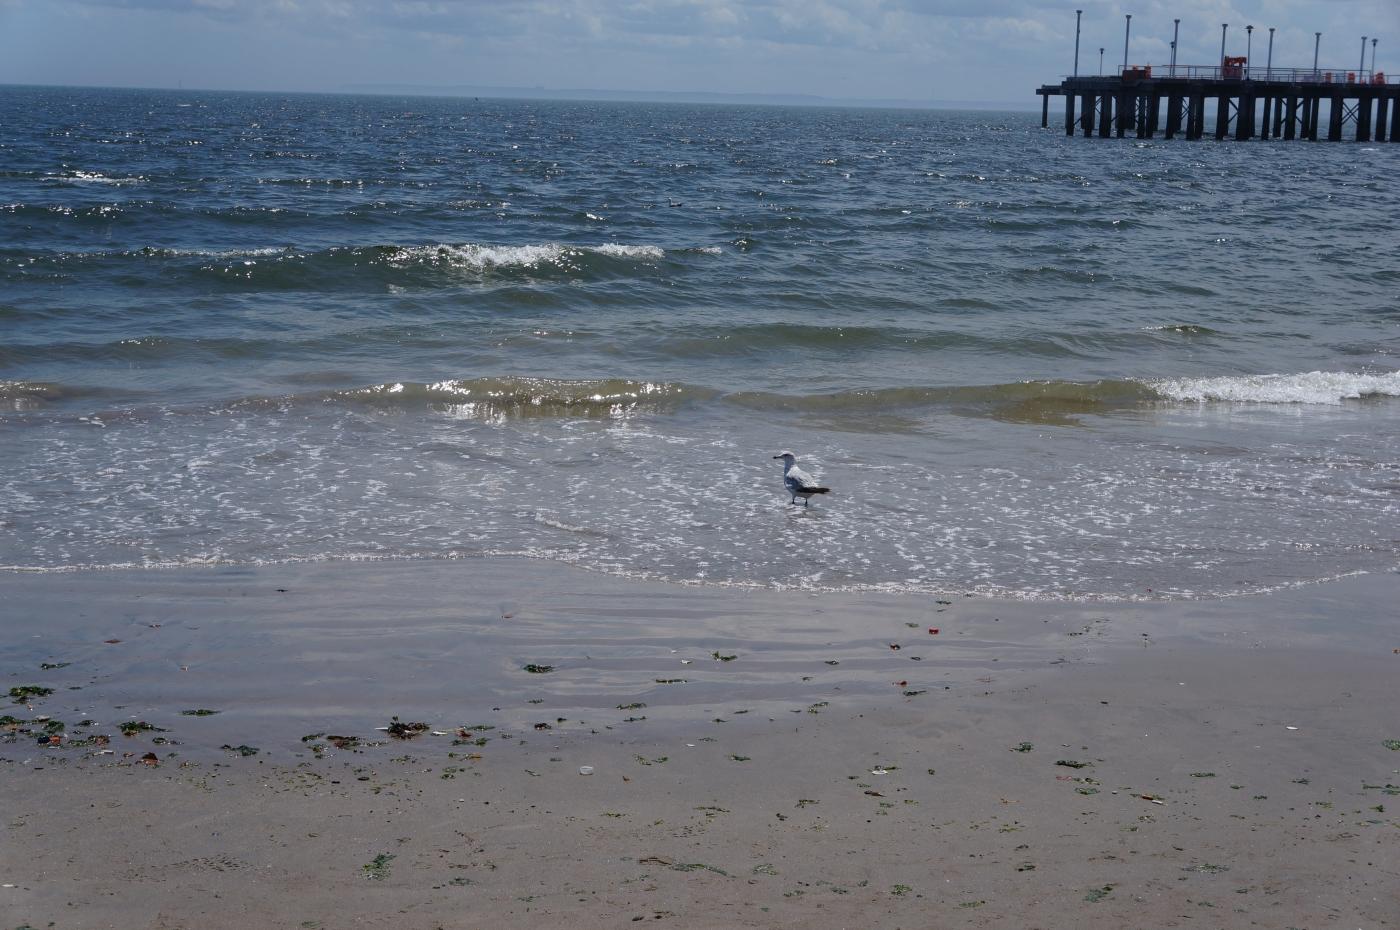 [jiejoy]国庆日休闲---海、沙滩、人_图1-14